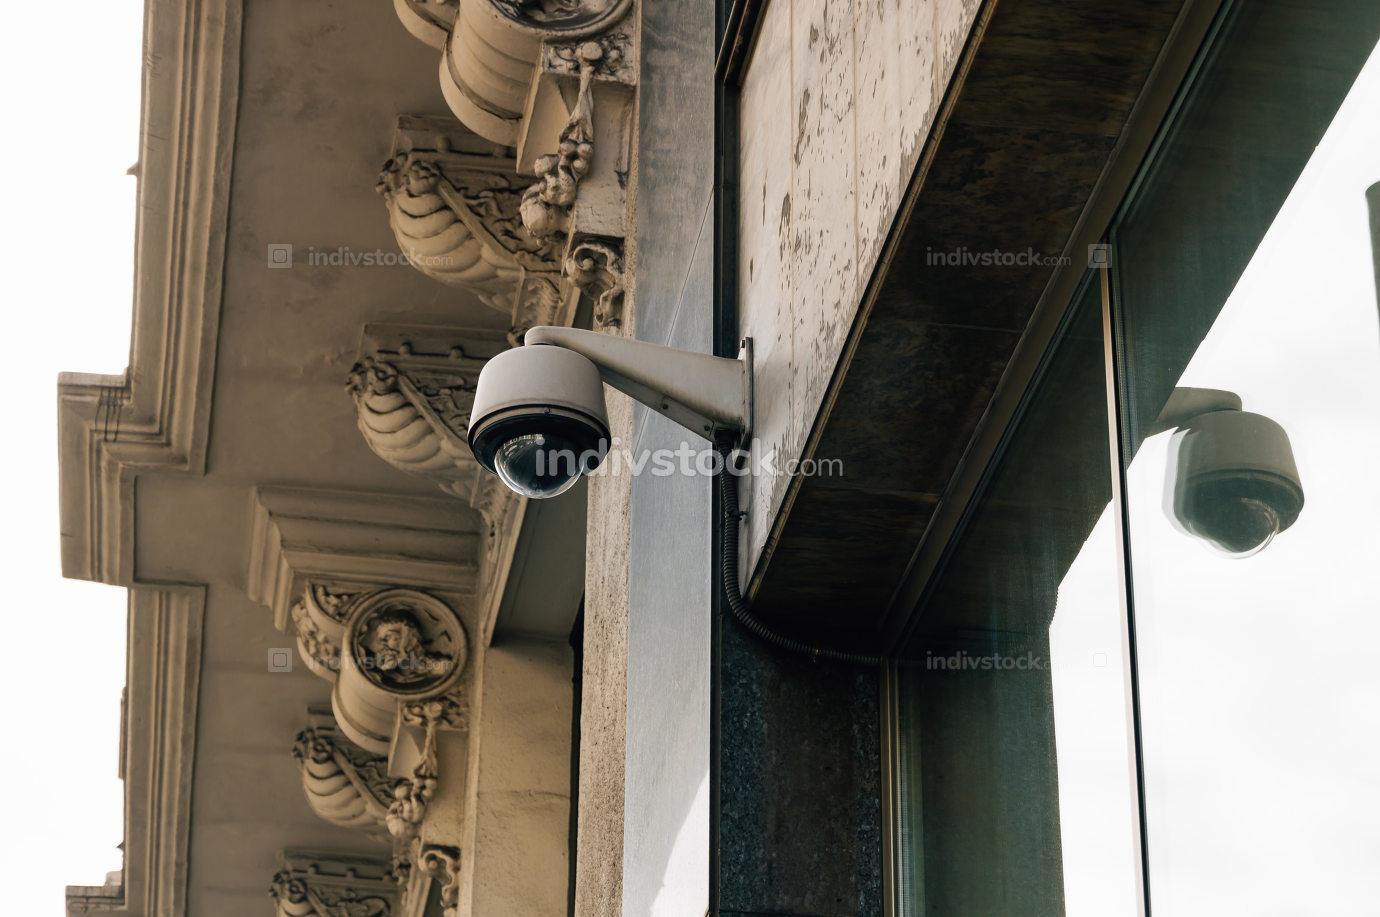 CCTV surveillance camera in the city